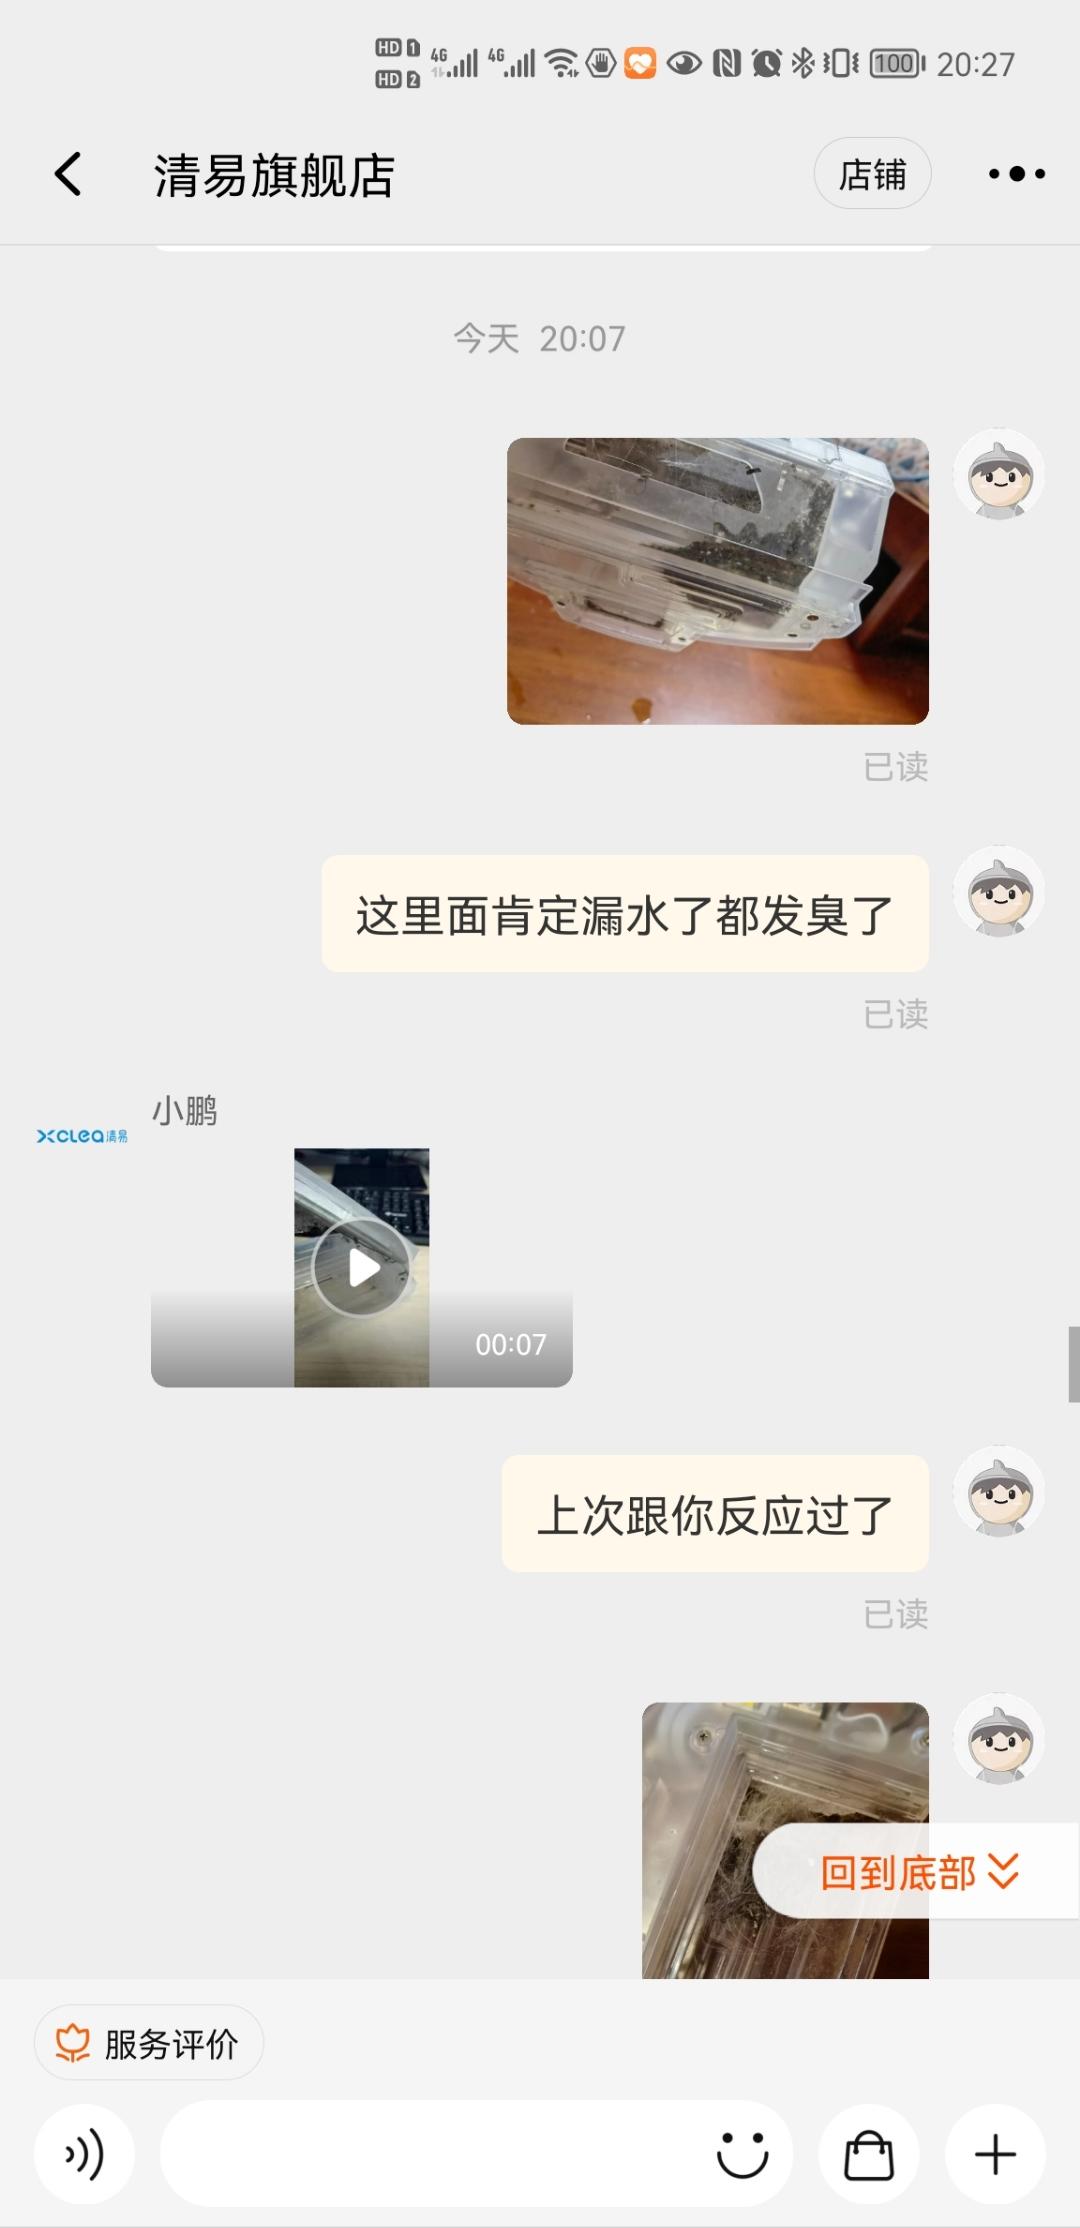 Screenshot_20210903_202740_com.taobao.taobao.jpg